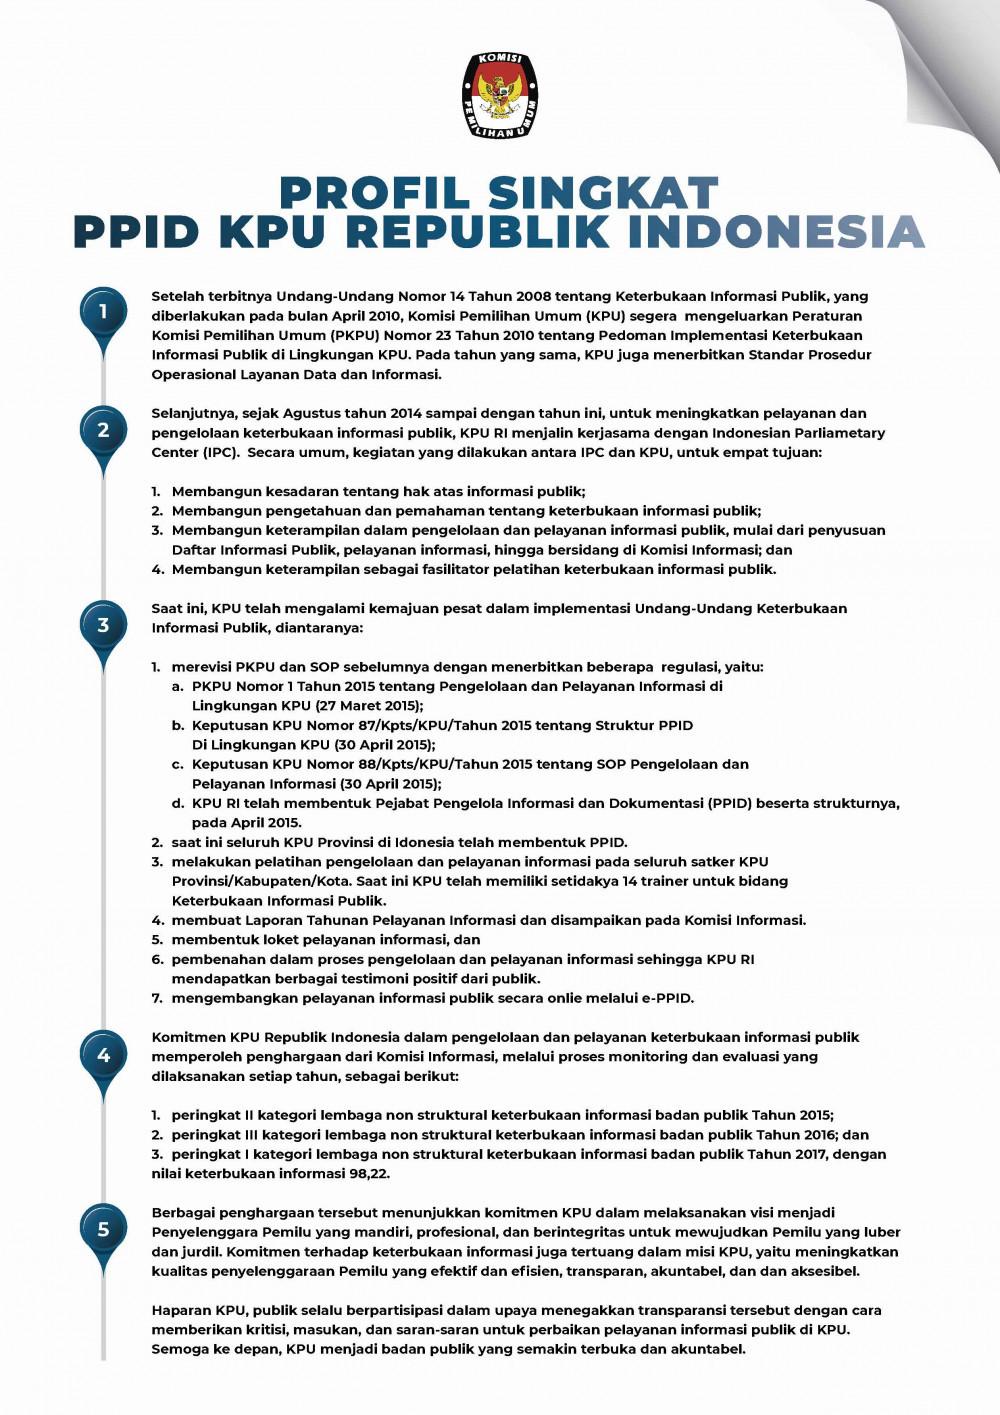 Profil Singkat PPID